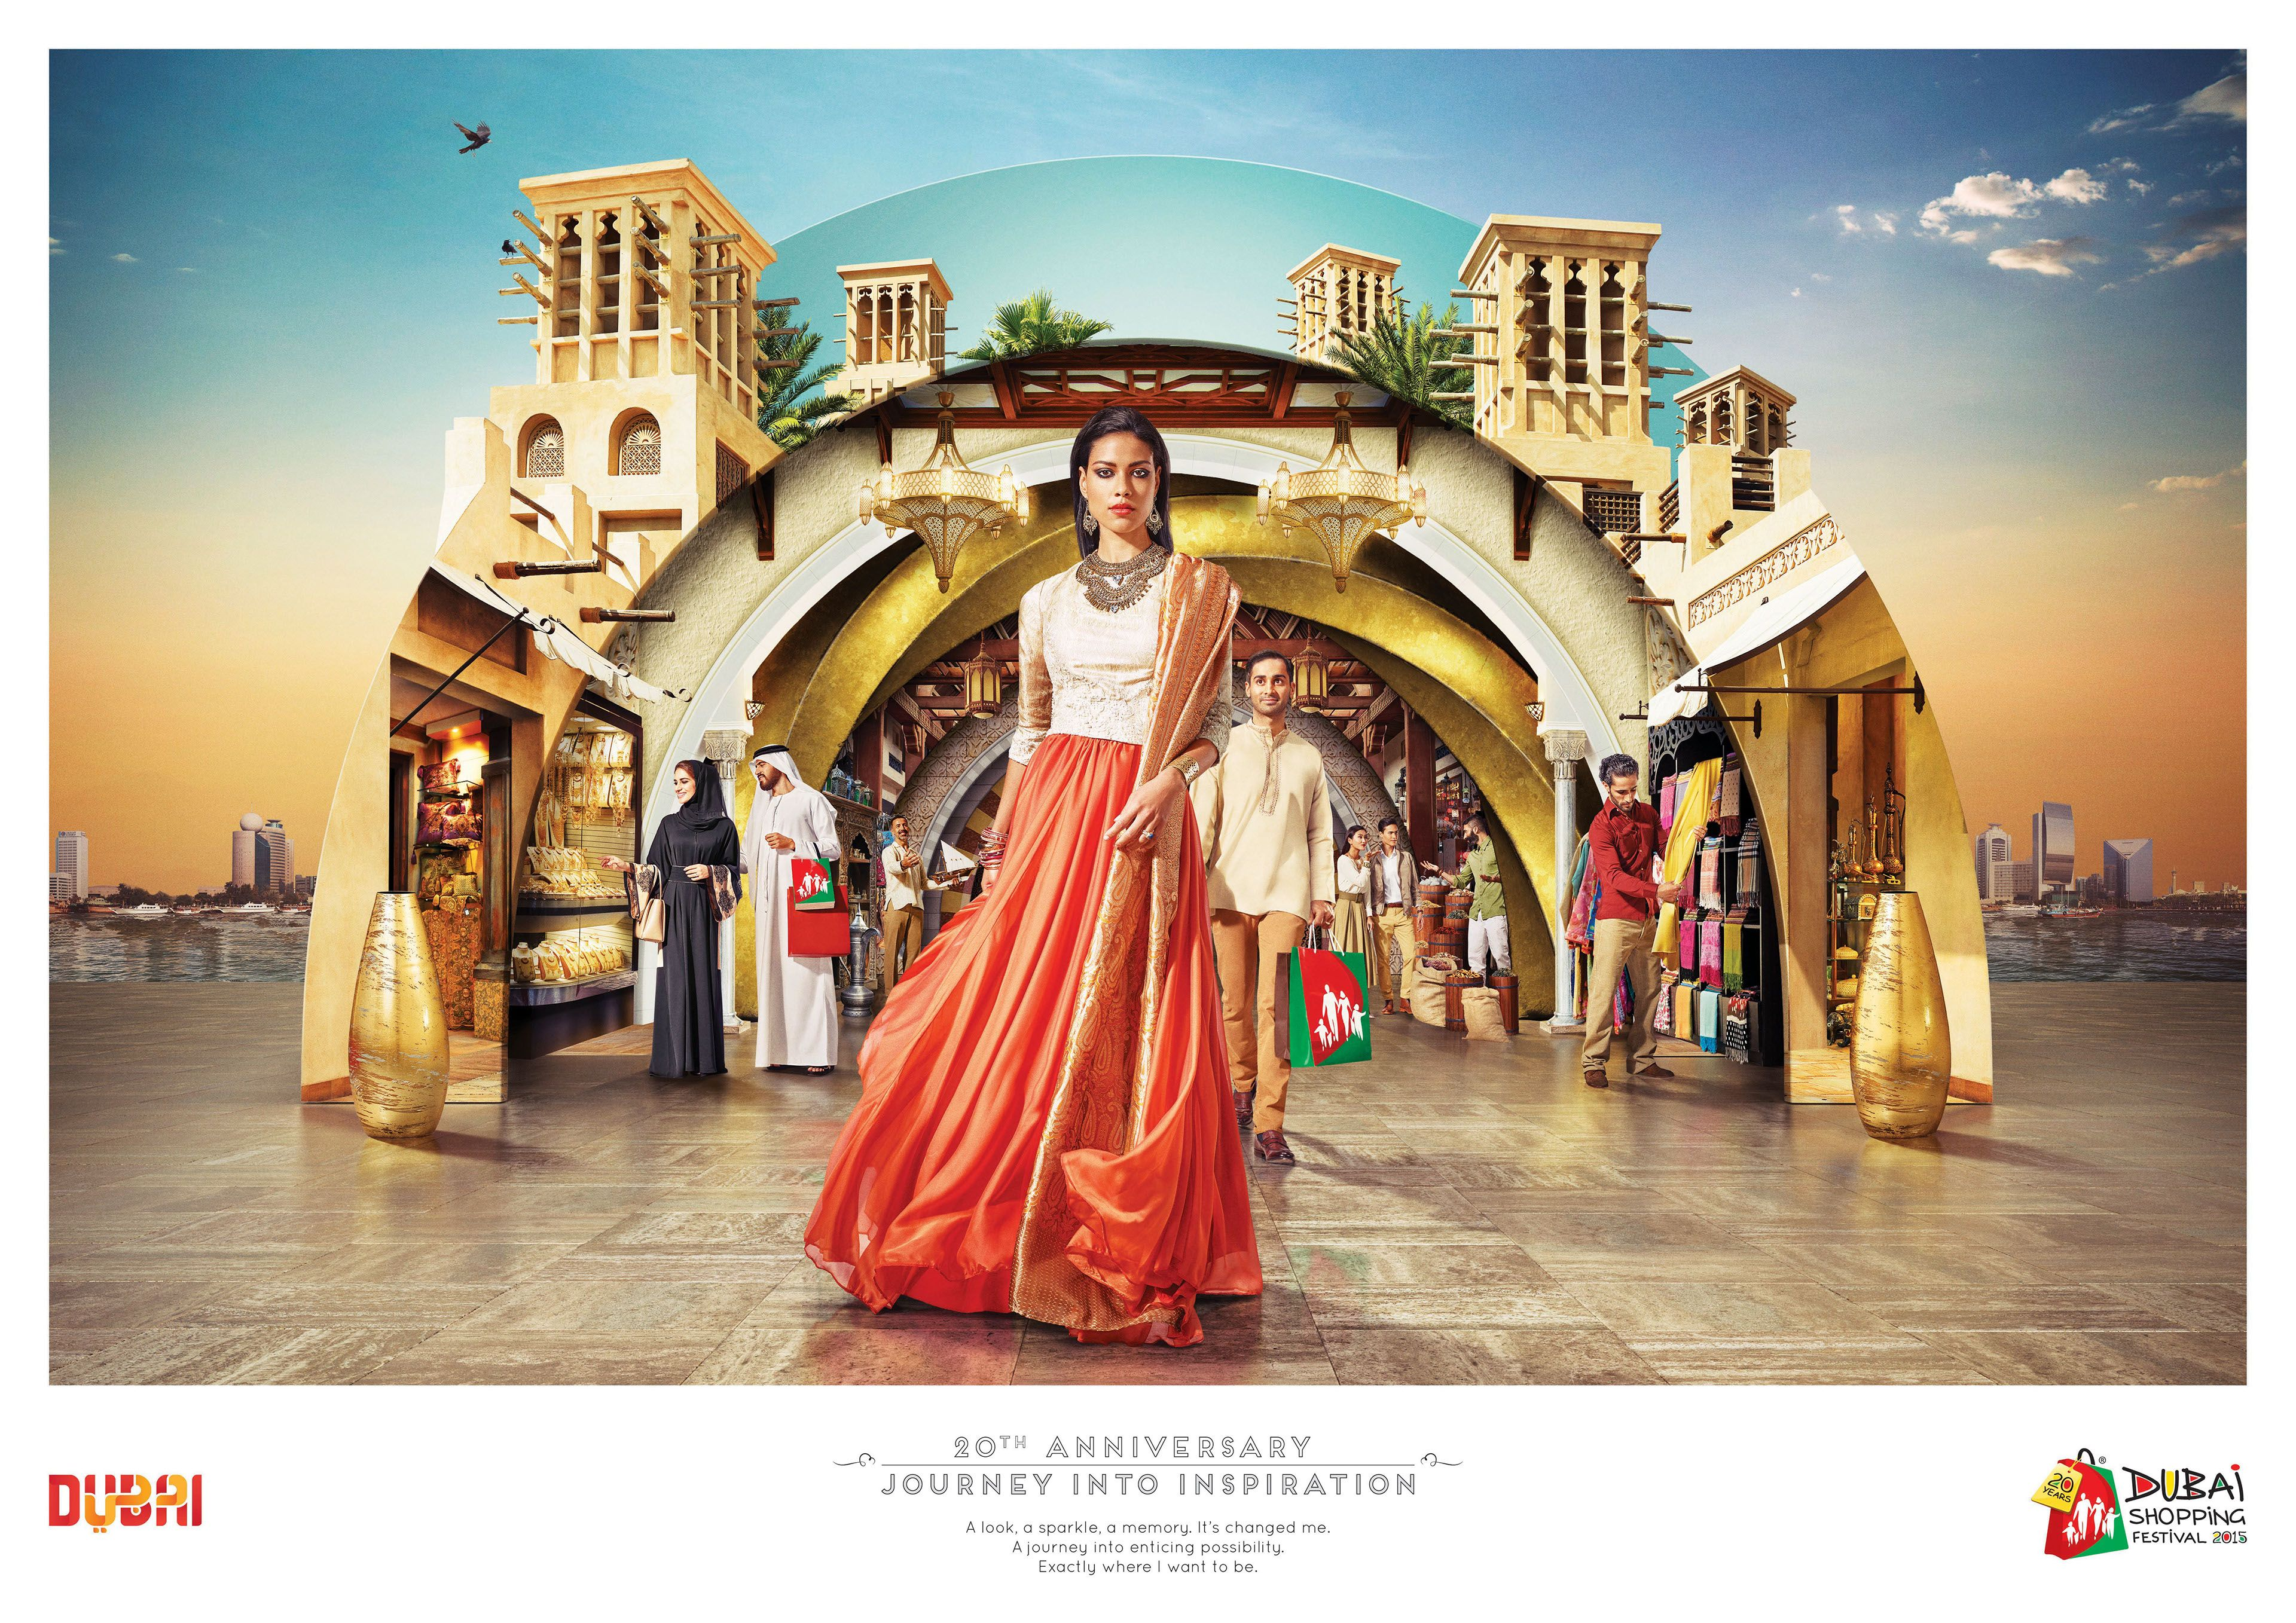 Dubai Shopping Festival // Journey into Inspiration on